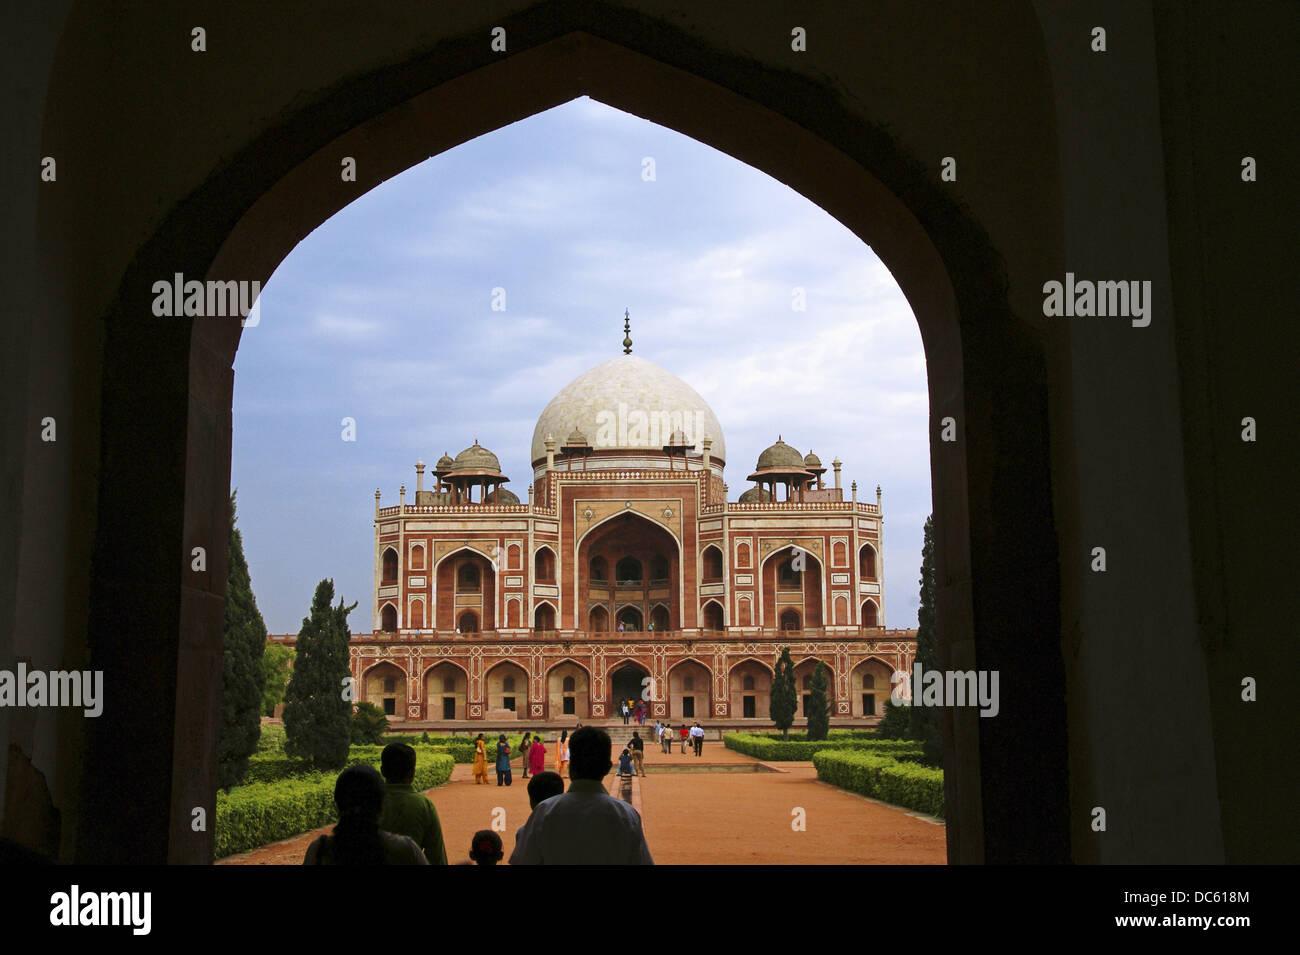 India. New Delhi. Humayun´s tombs - Stock Image